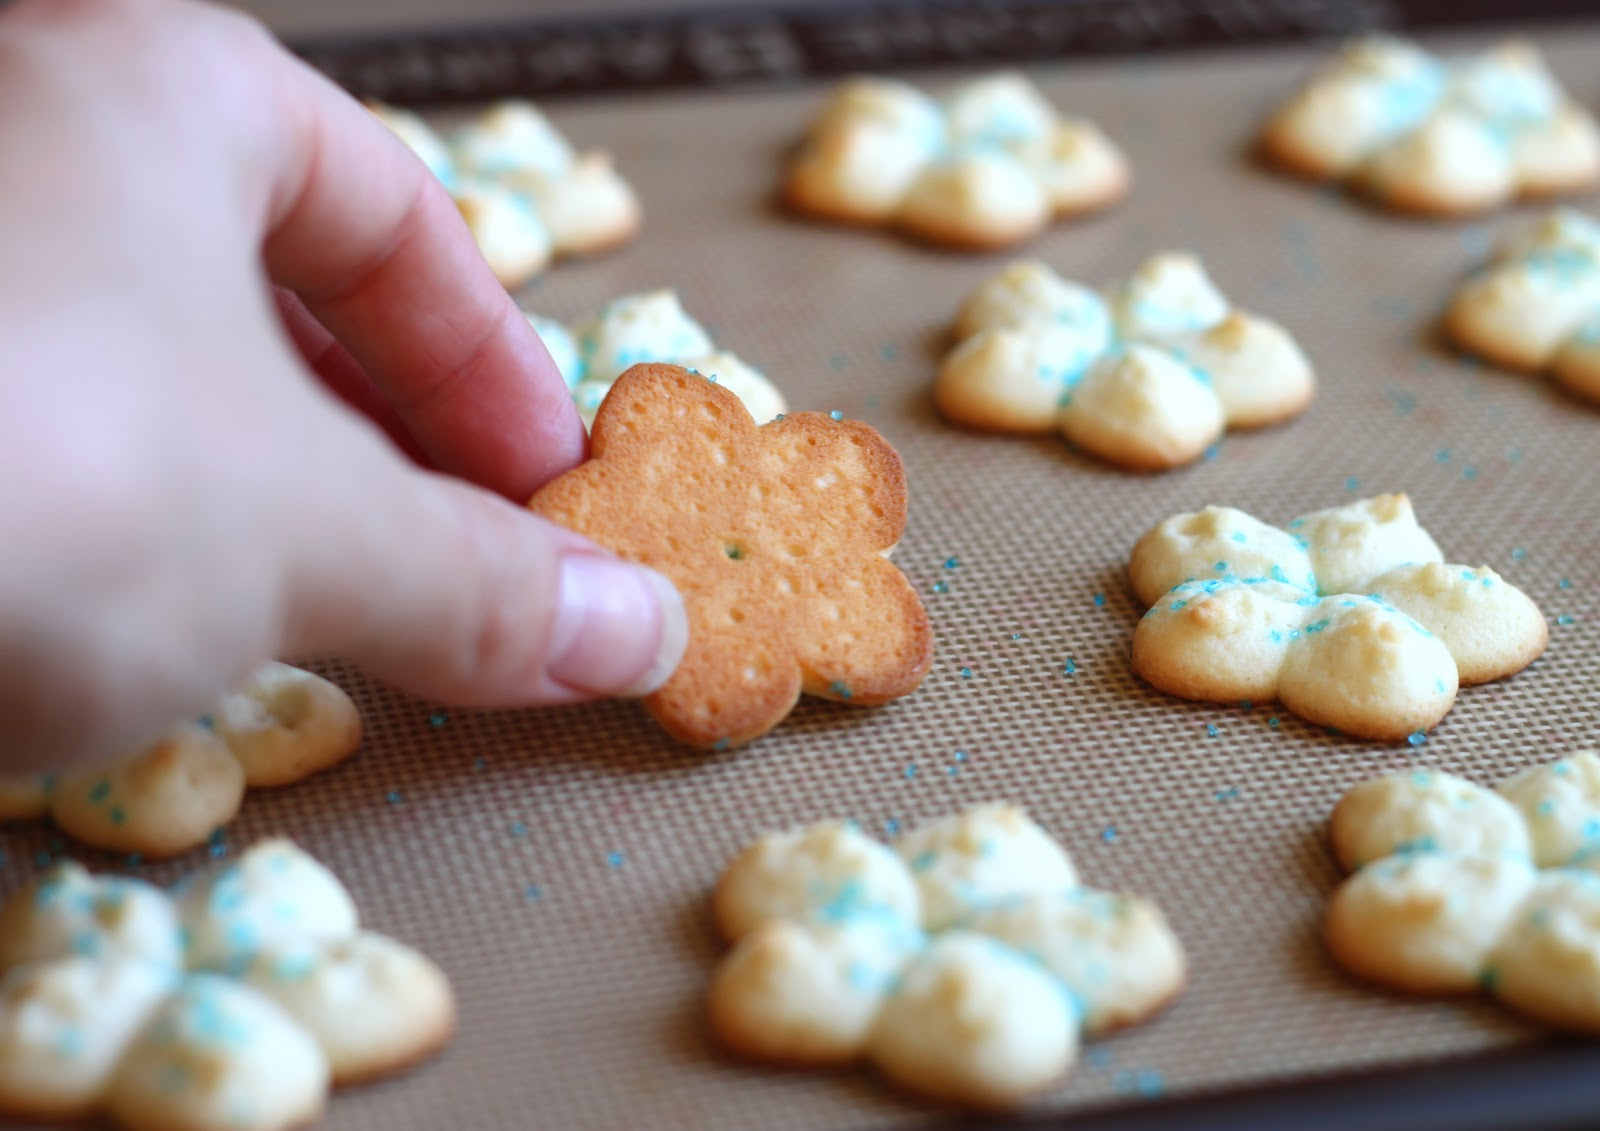 The Cilantropist: My Grandma's Spritz Cookies, or ...